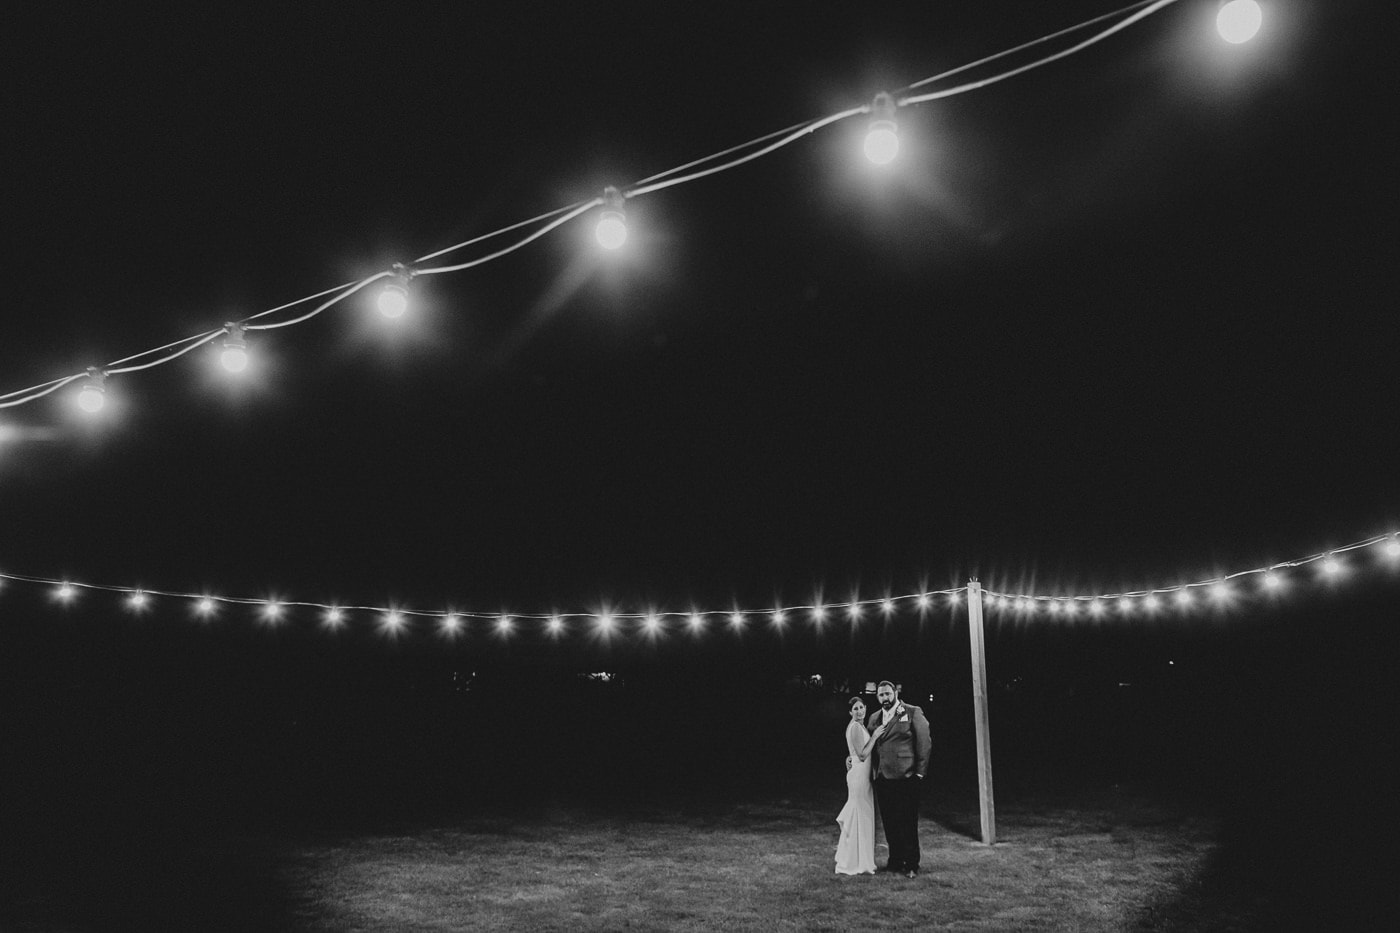 Couple under fairy lights - Wedding Photos at Flowerdale Estate by Melbourne Wedding Photographer